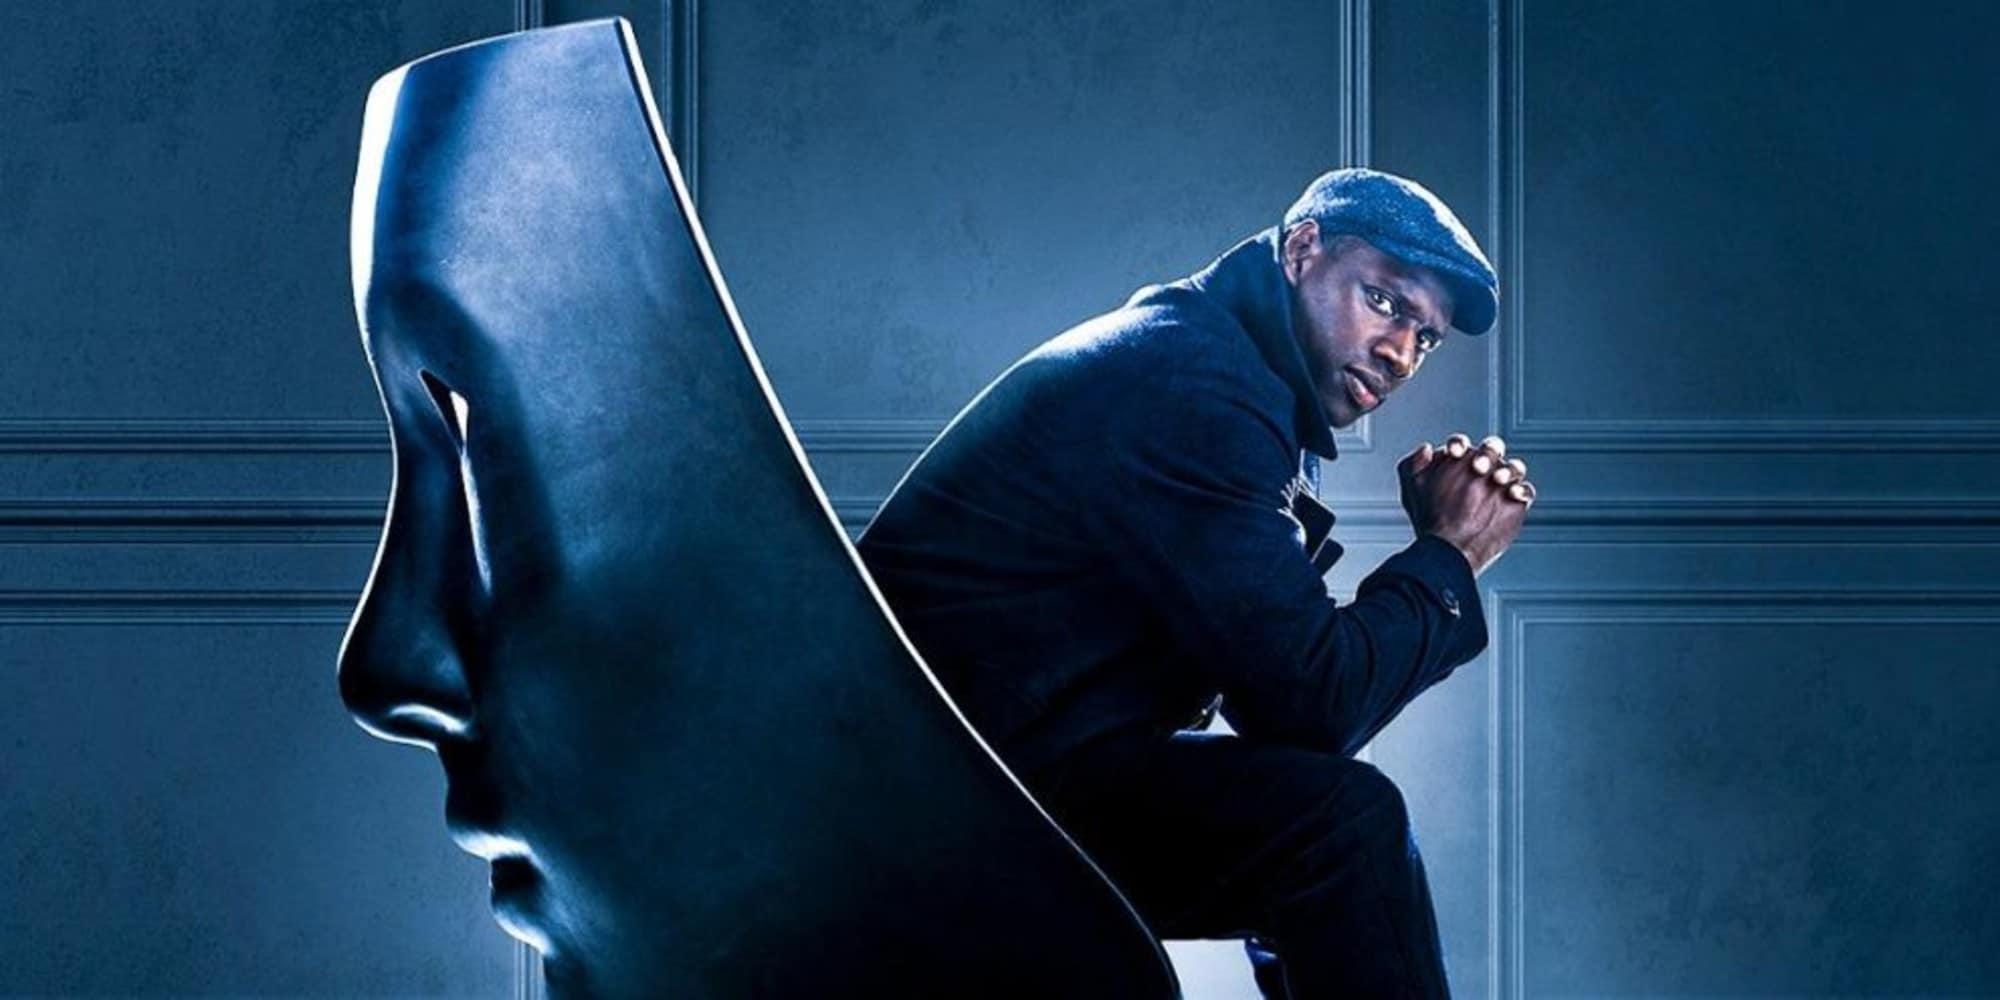 Lupin il ladro gentiluomo torna su Netflix 4